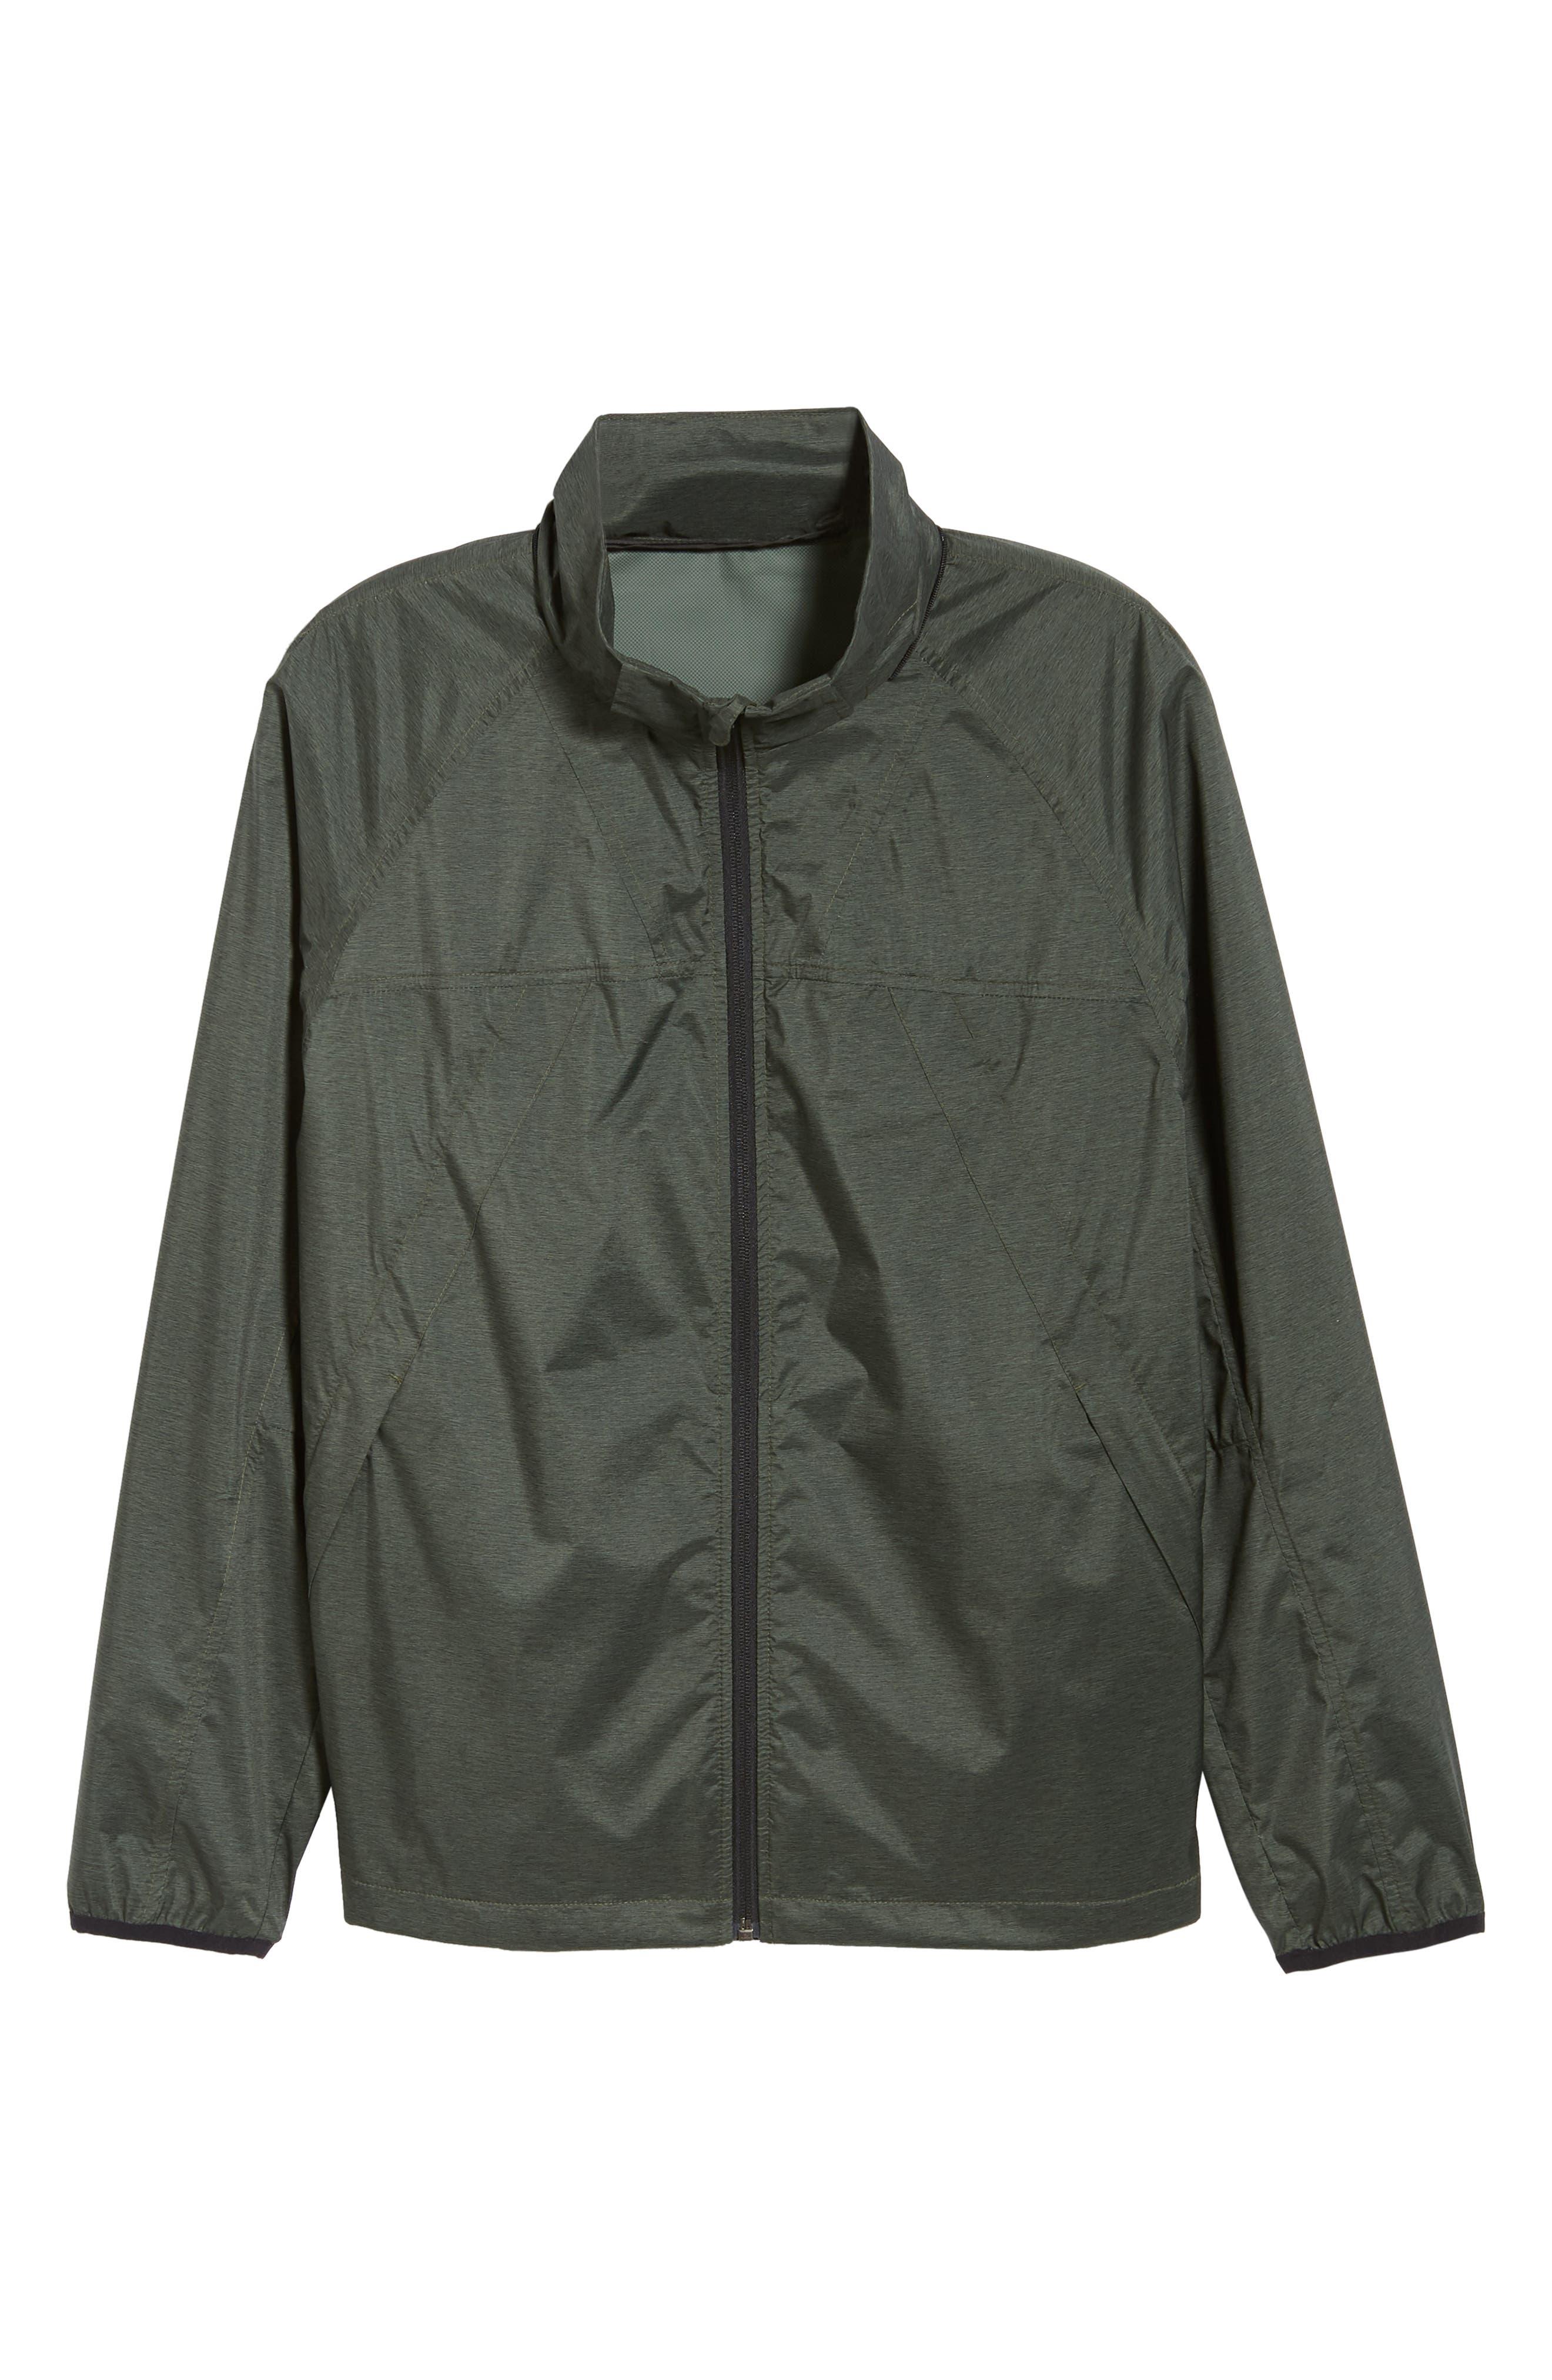 Xieite Hooded Jacket,                             Alternate thumbnail 6, color,                             GREEN TACTICAL MELANGE